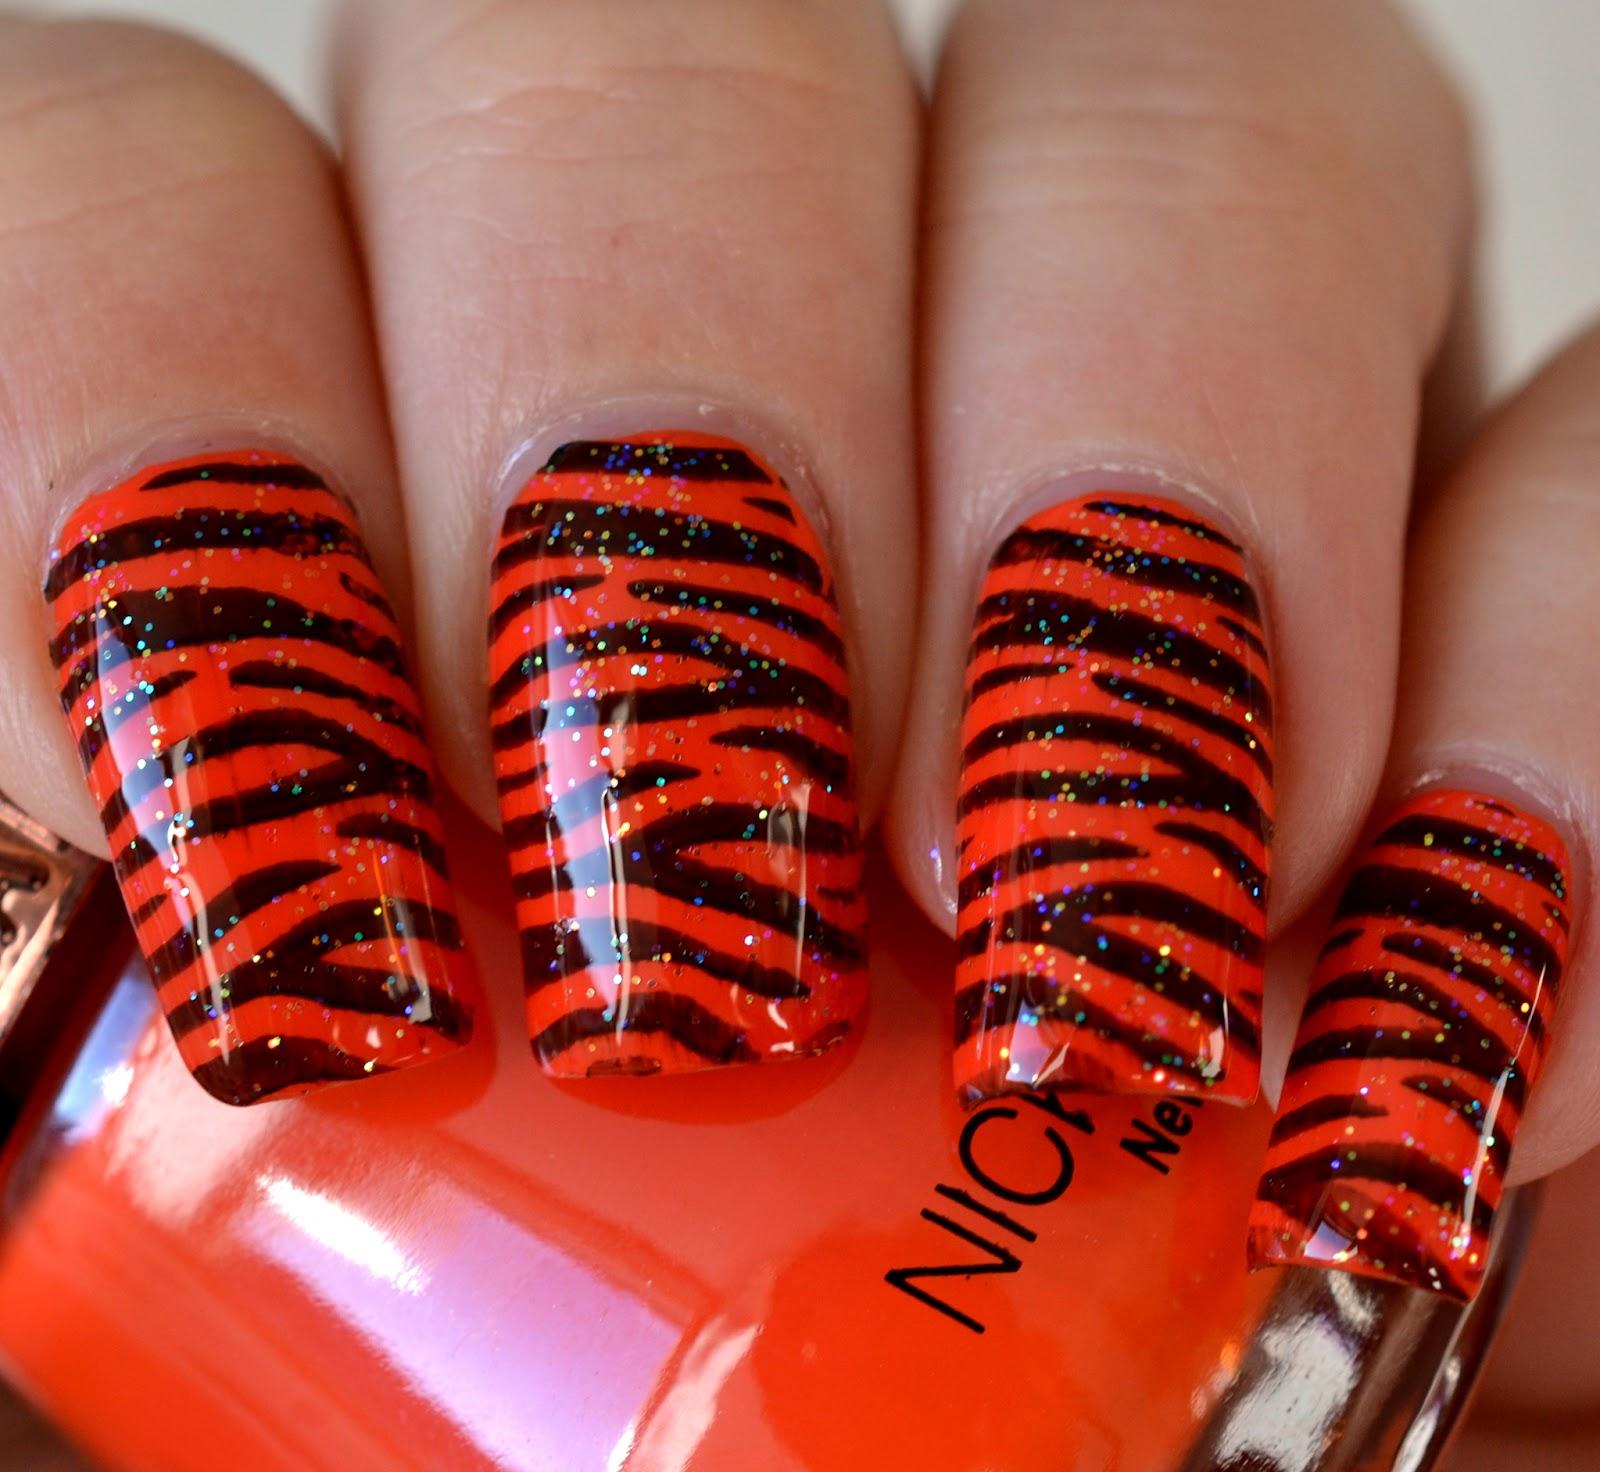 http://lenas-sofa.blogspot.de/2015/03/nicka-k-new-york-ny-135-tangerine.html